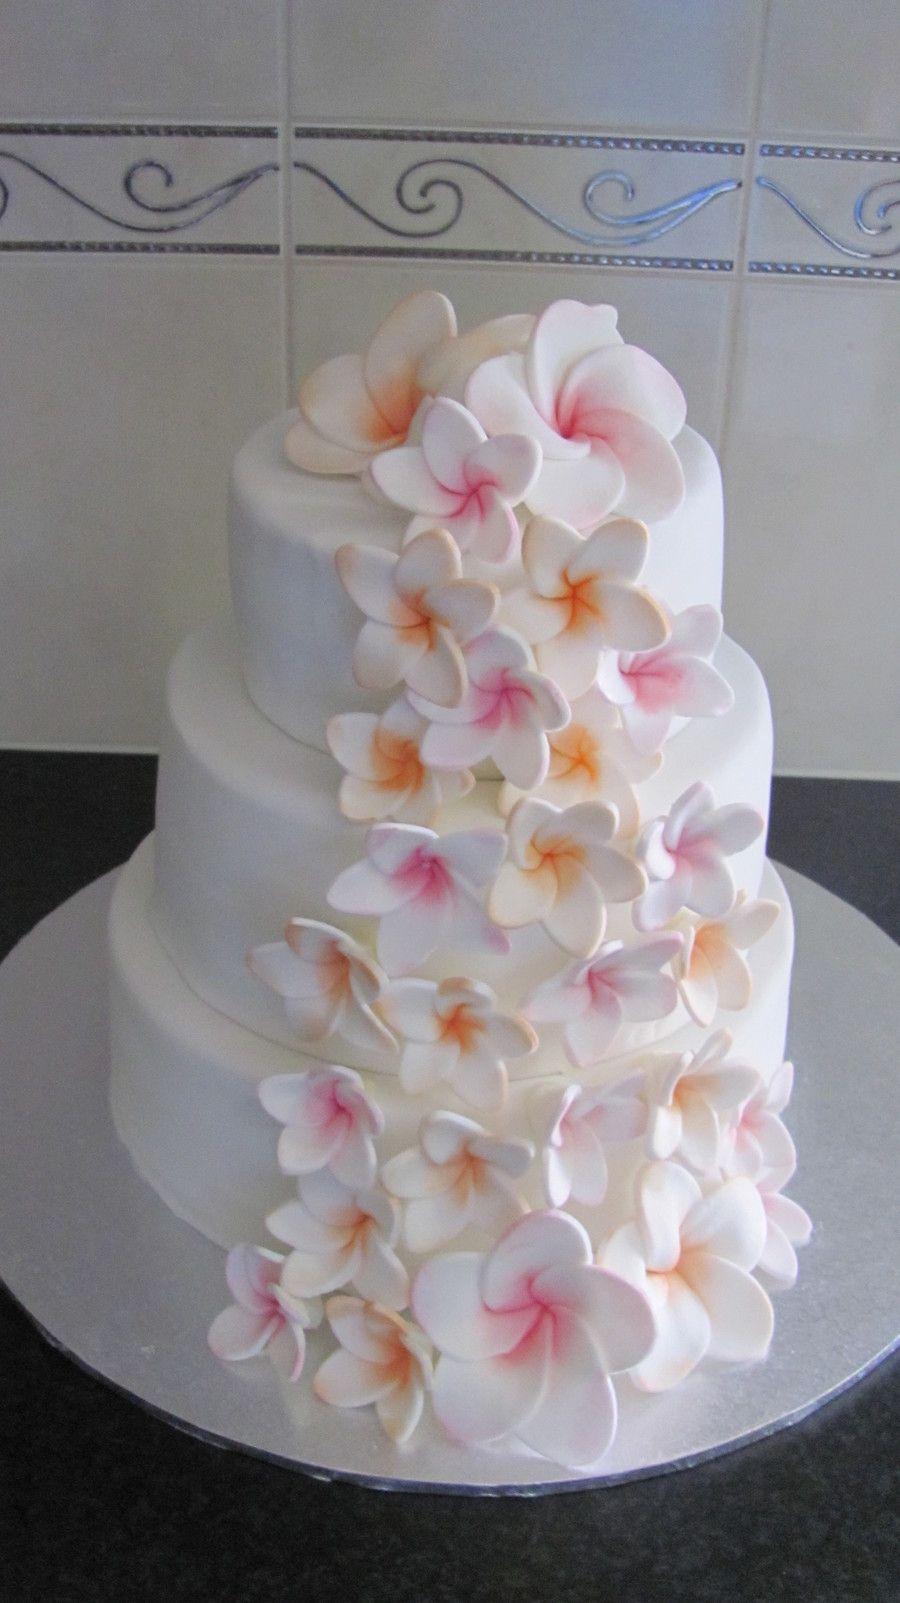 Plumeria Frangipani Wedding Cake On Cake Central Round Wedding